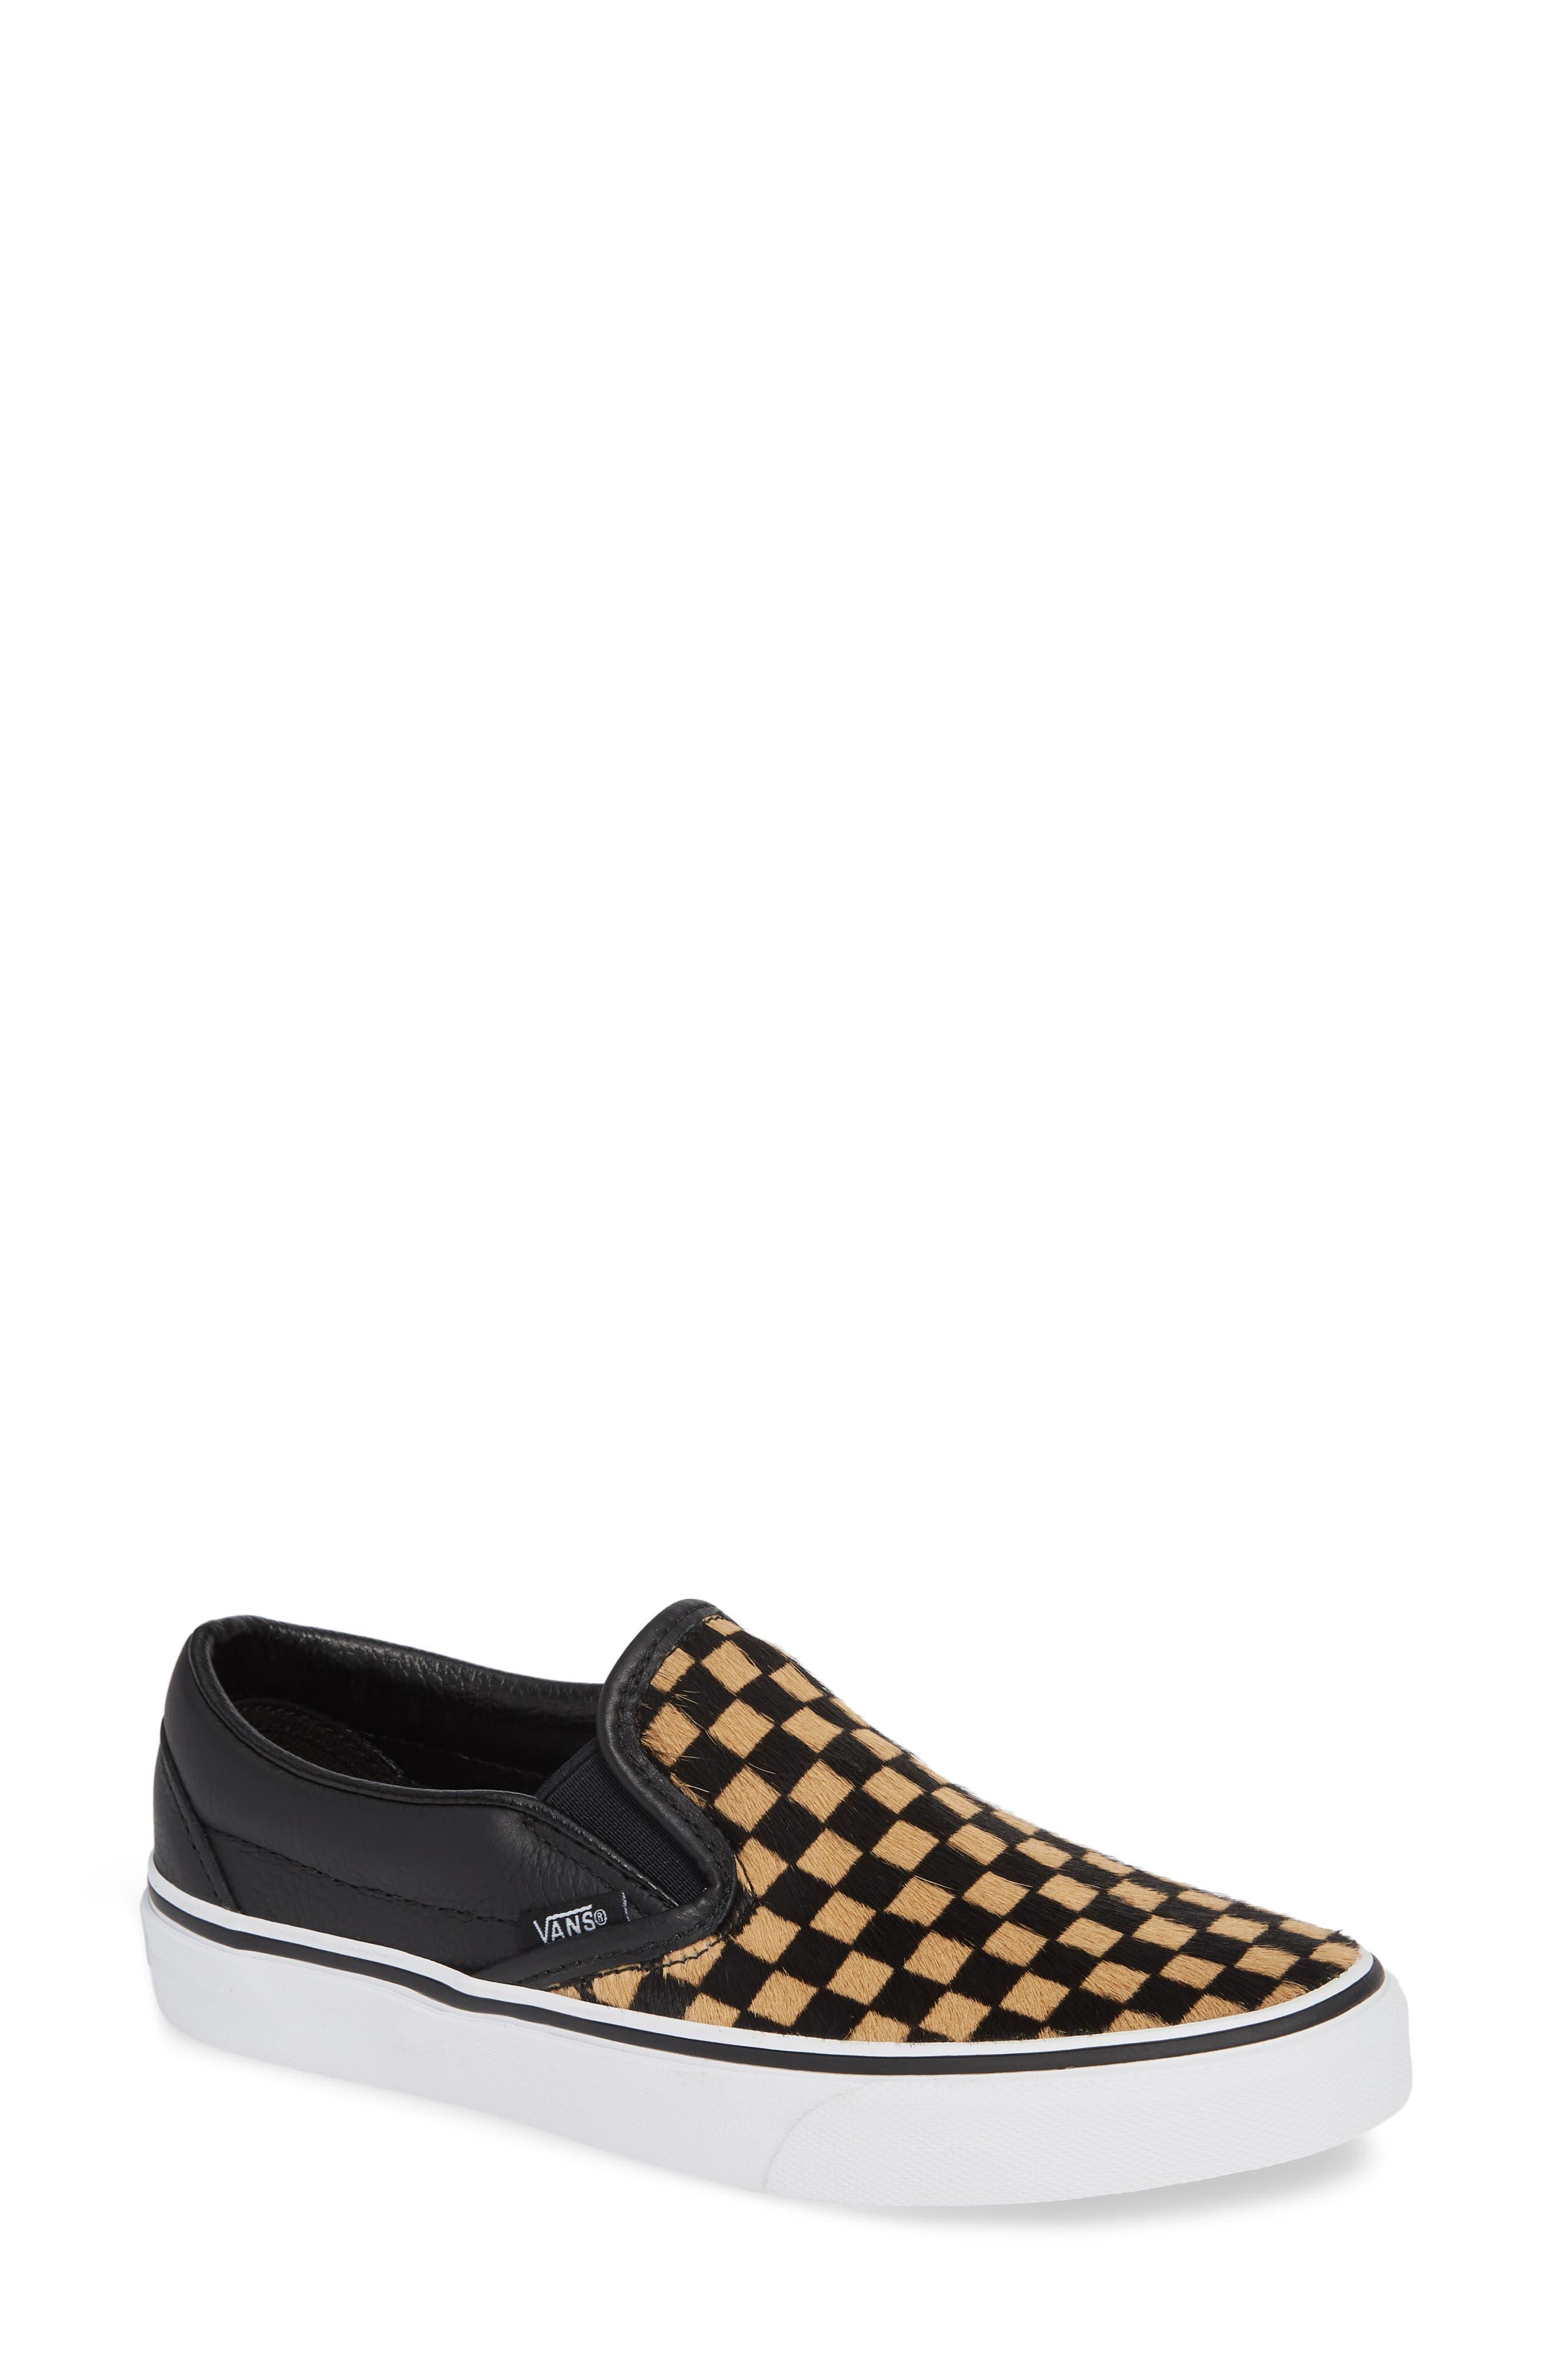 VANS,                             UA Classic Genuine Calf Hair Slip-On Sneaker,                             Main thumbnail 1, color,                             001